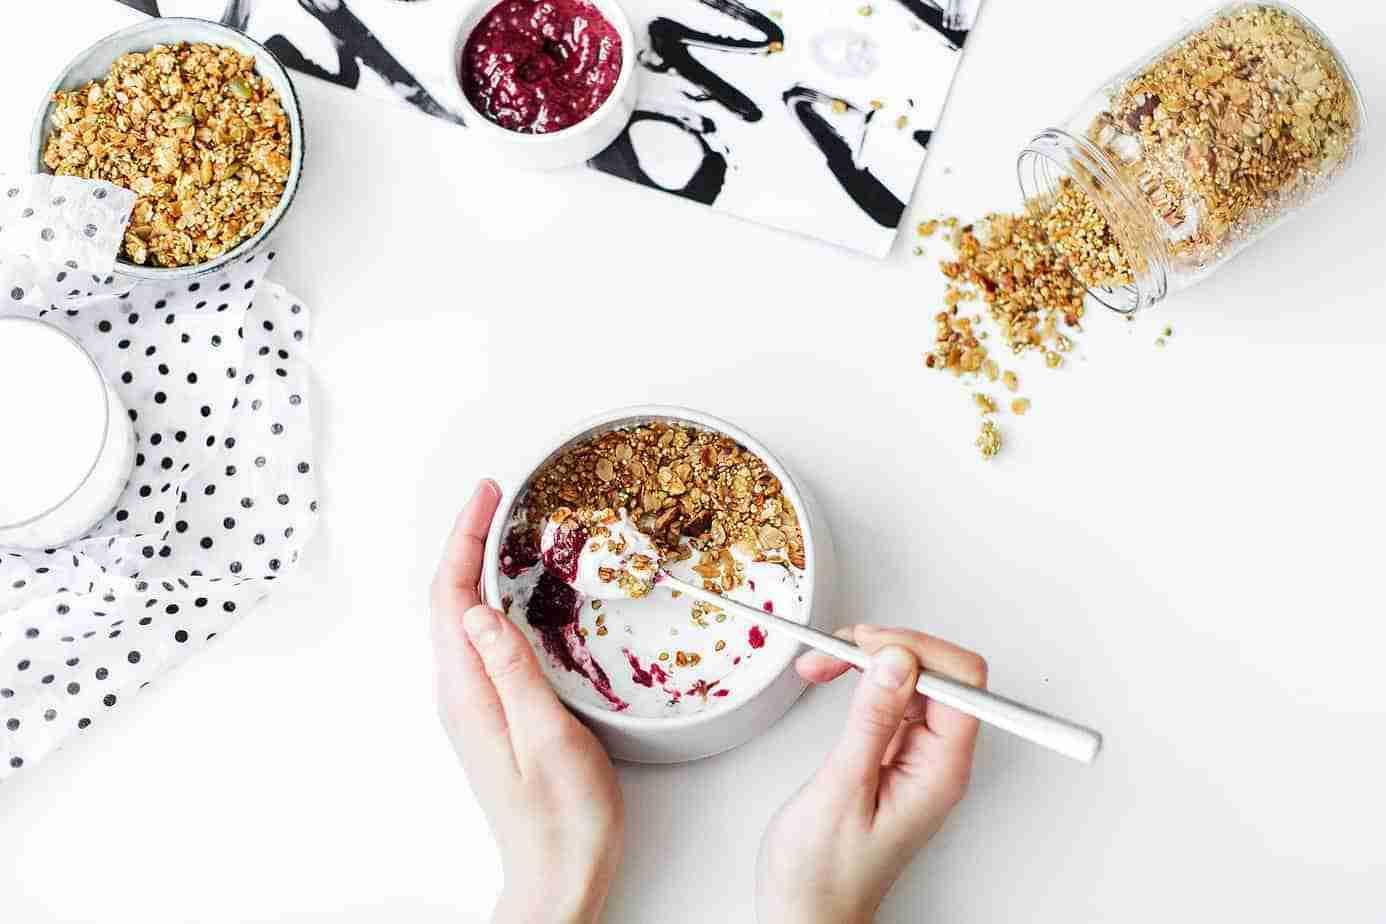 Yogurt vegetale - farlo in casa con la yogurtiera